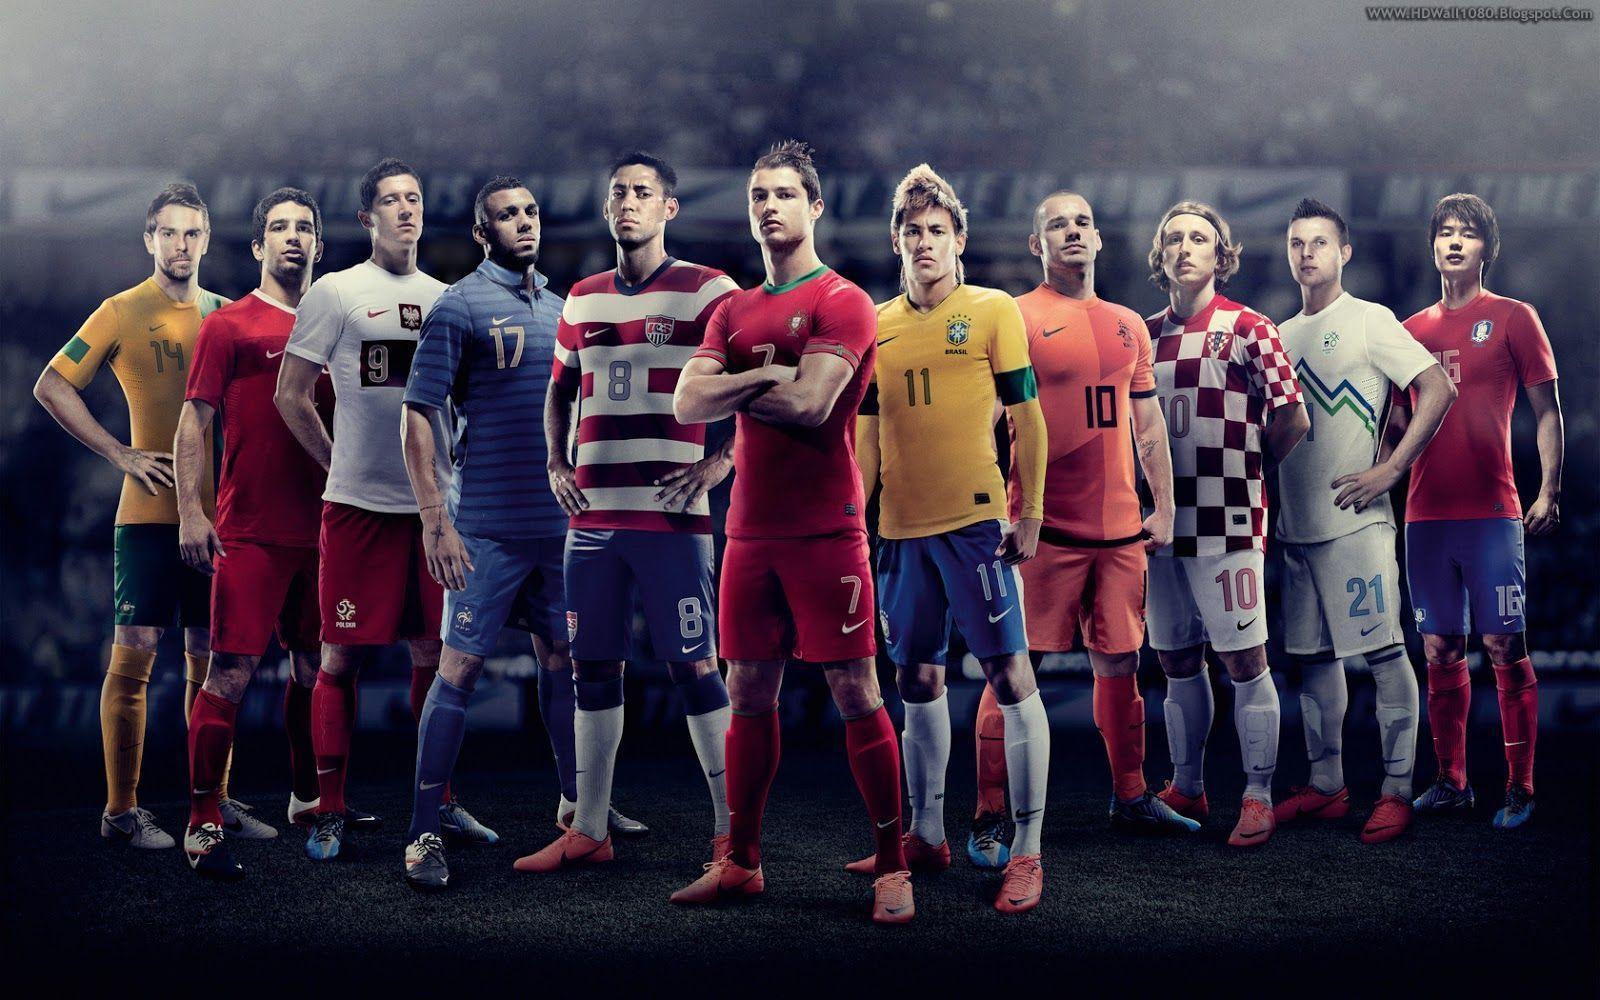 Football PC Wallpapers - 4k, HD ...